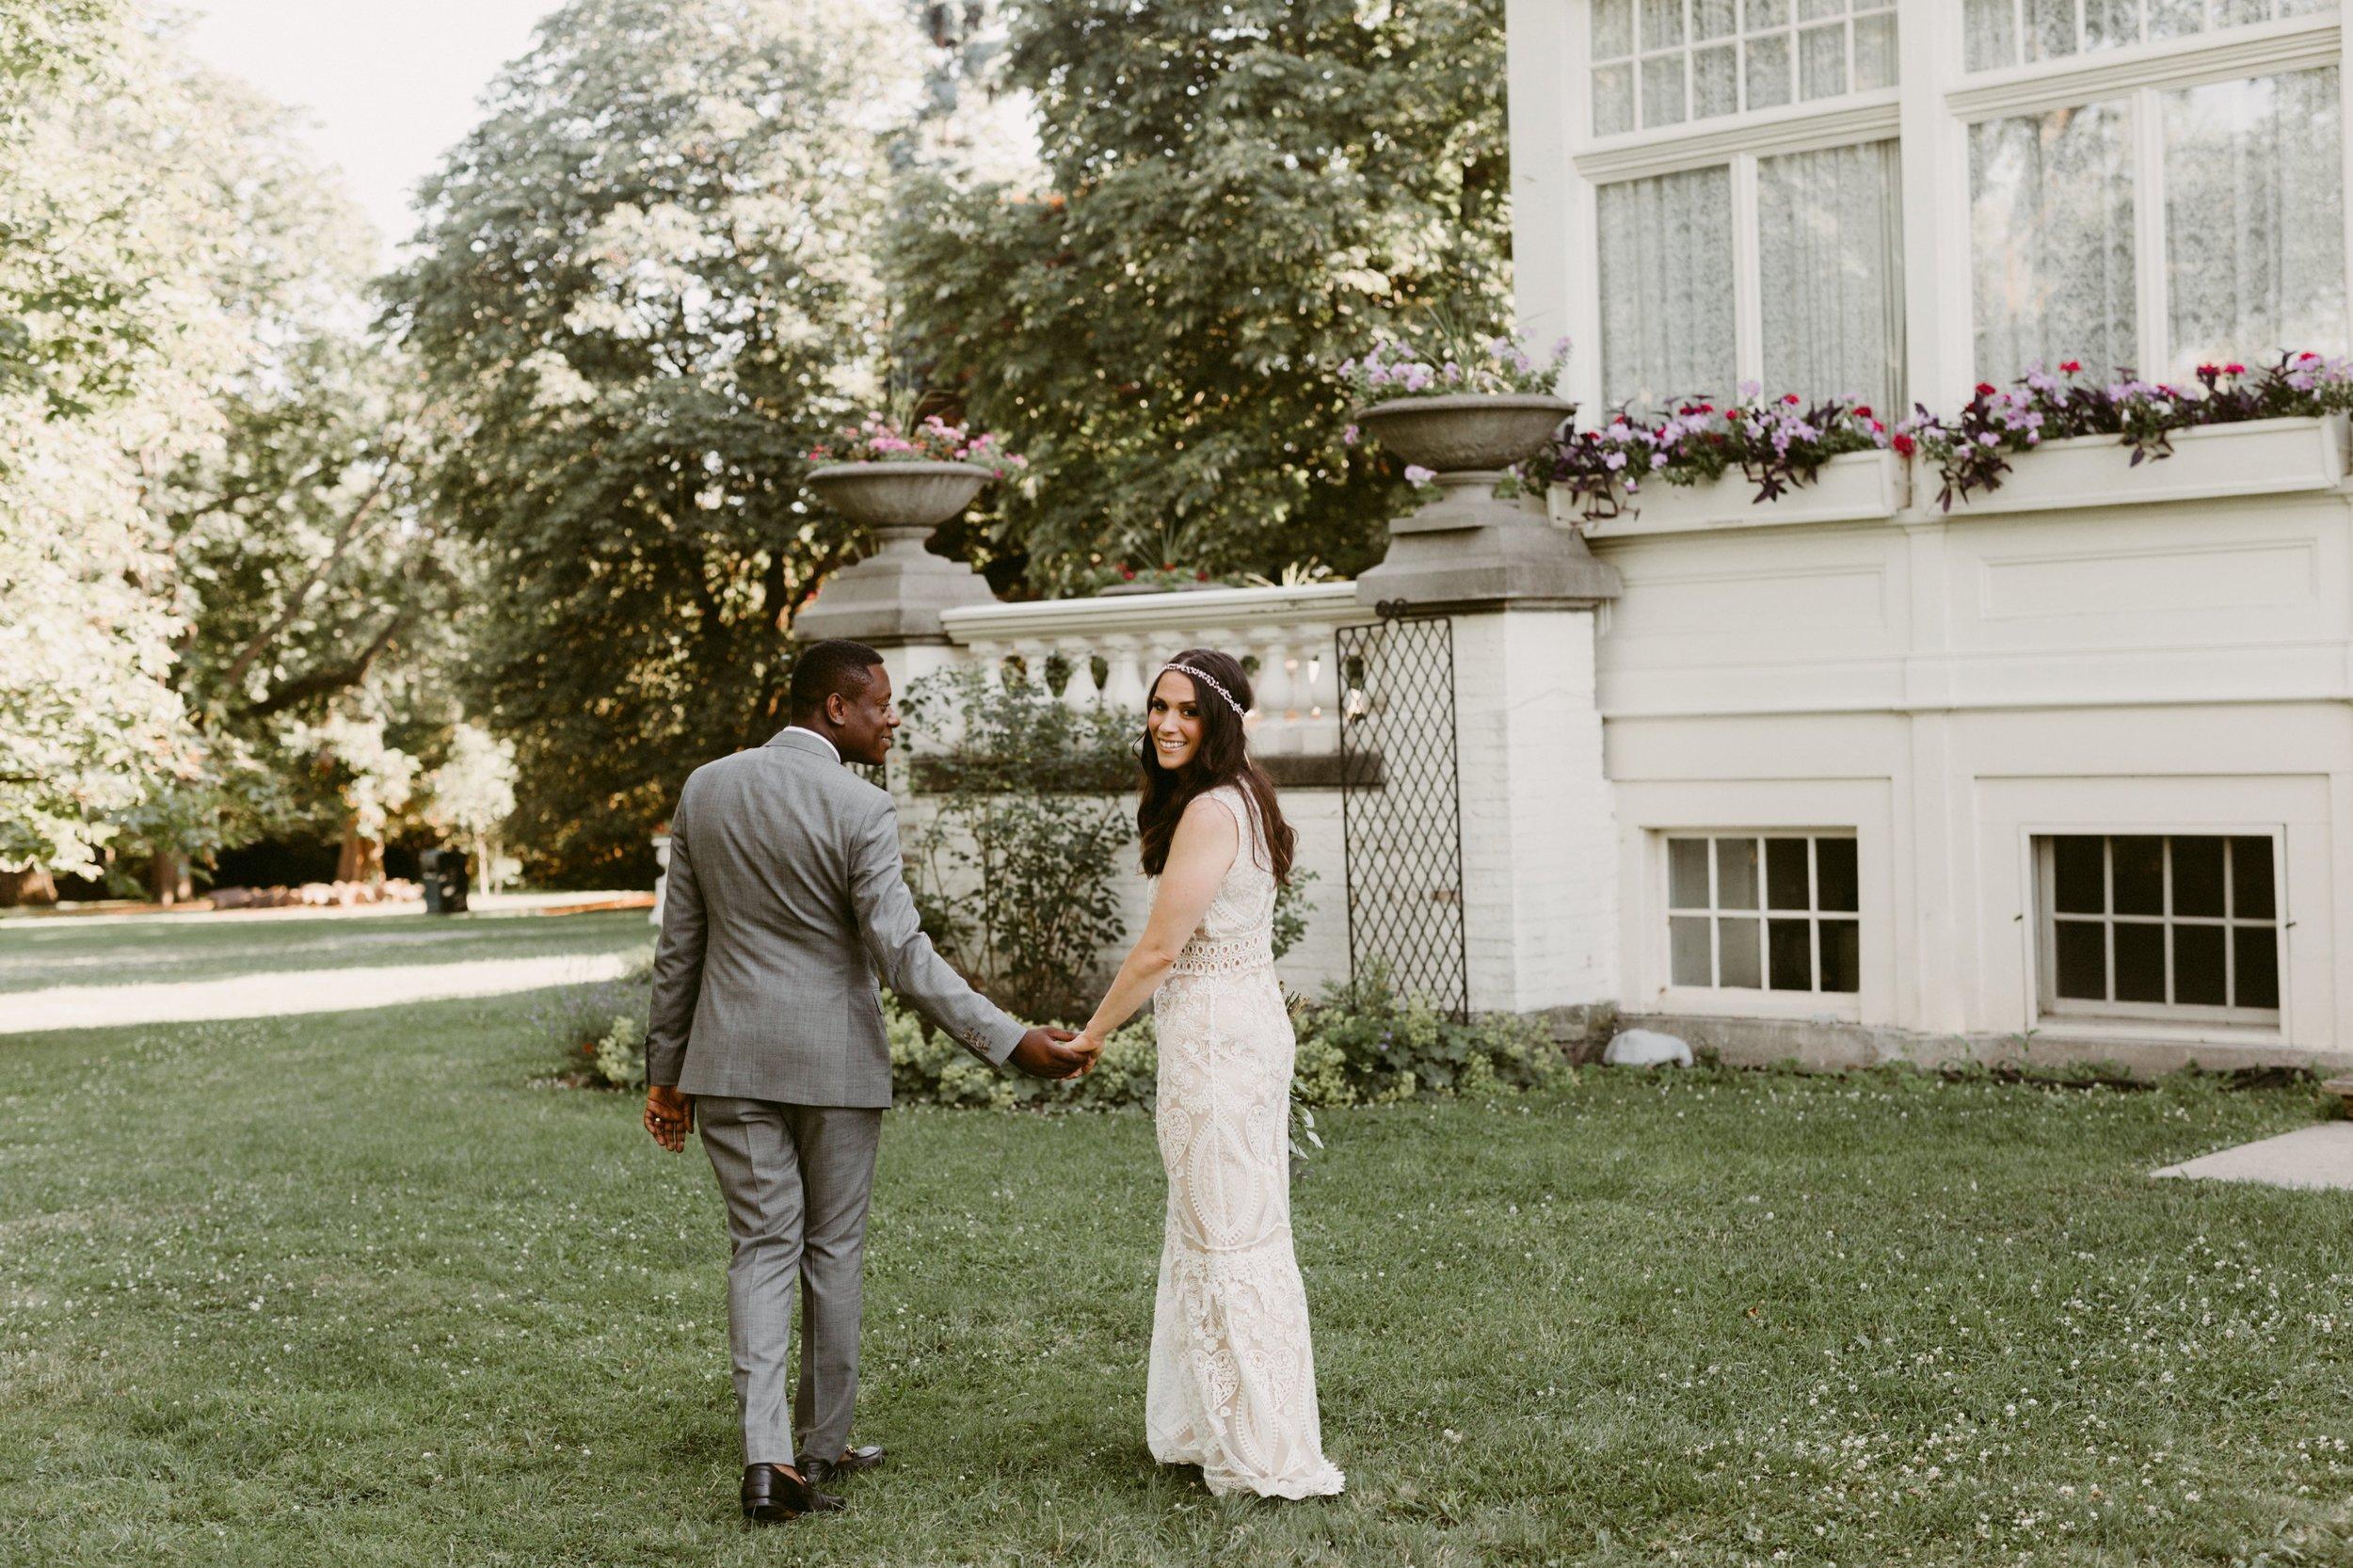 044_Spadina House Wedding (302 of 748)_House_Spadina_intimate_Toronto_Wedding.jpg